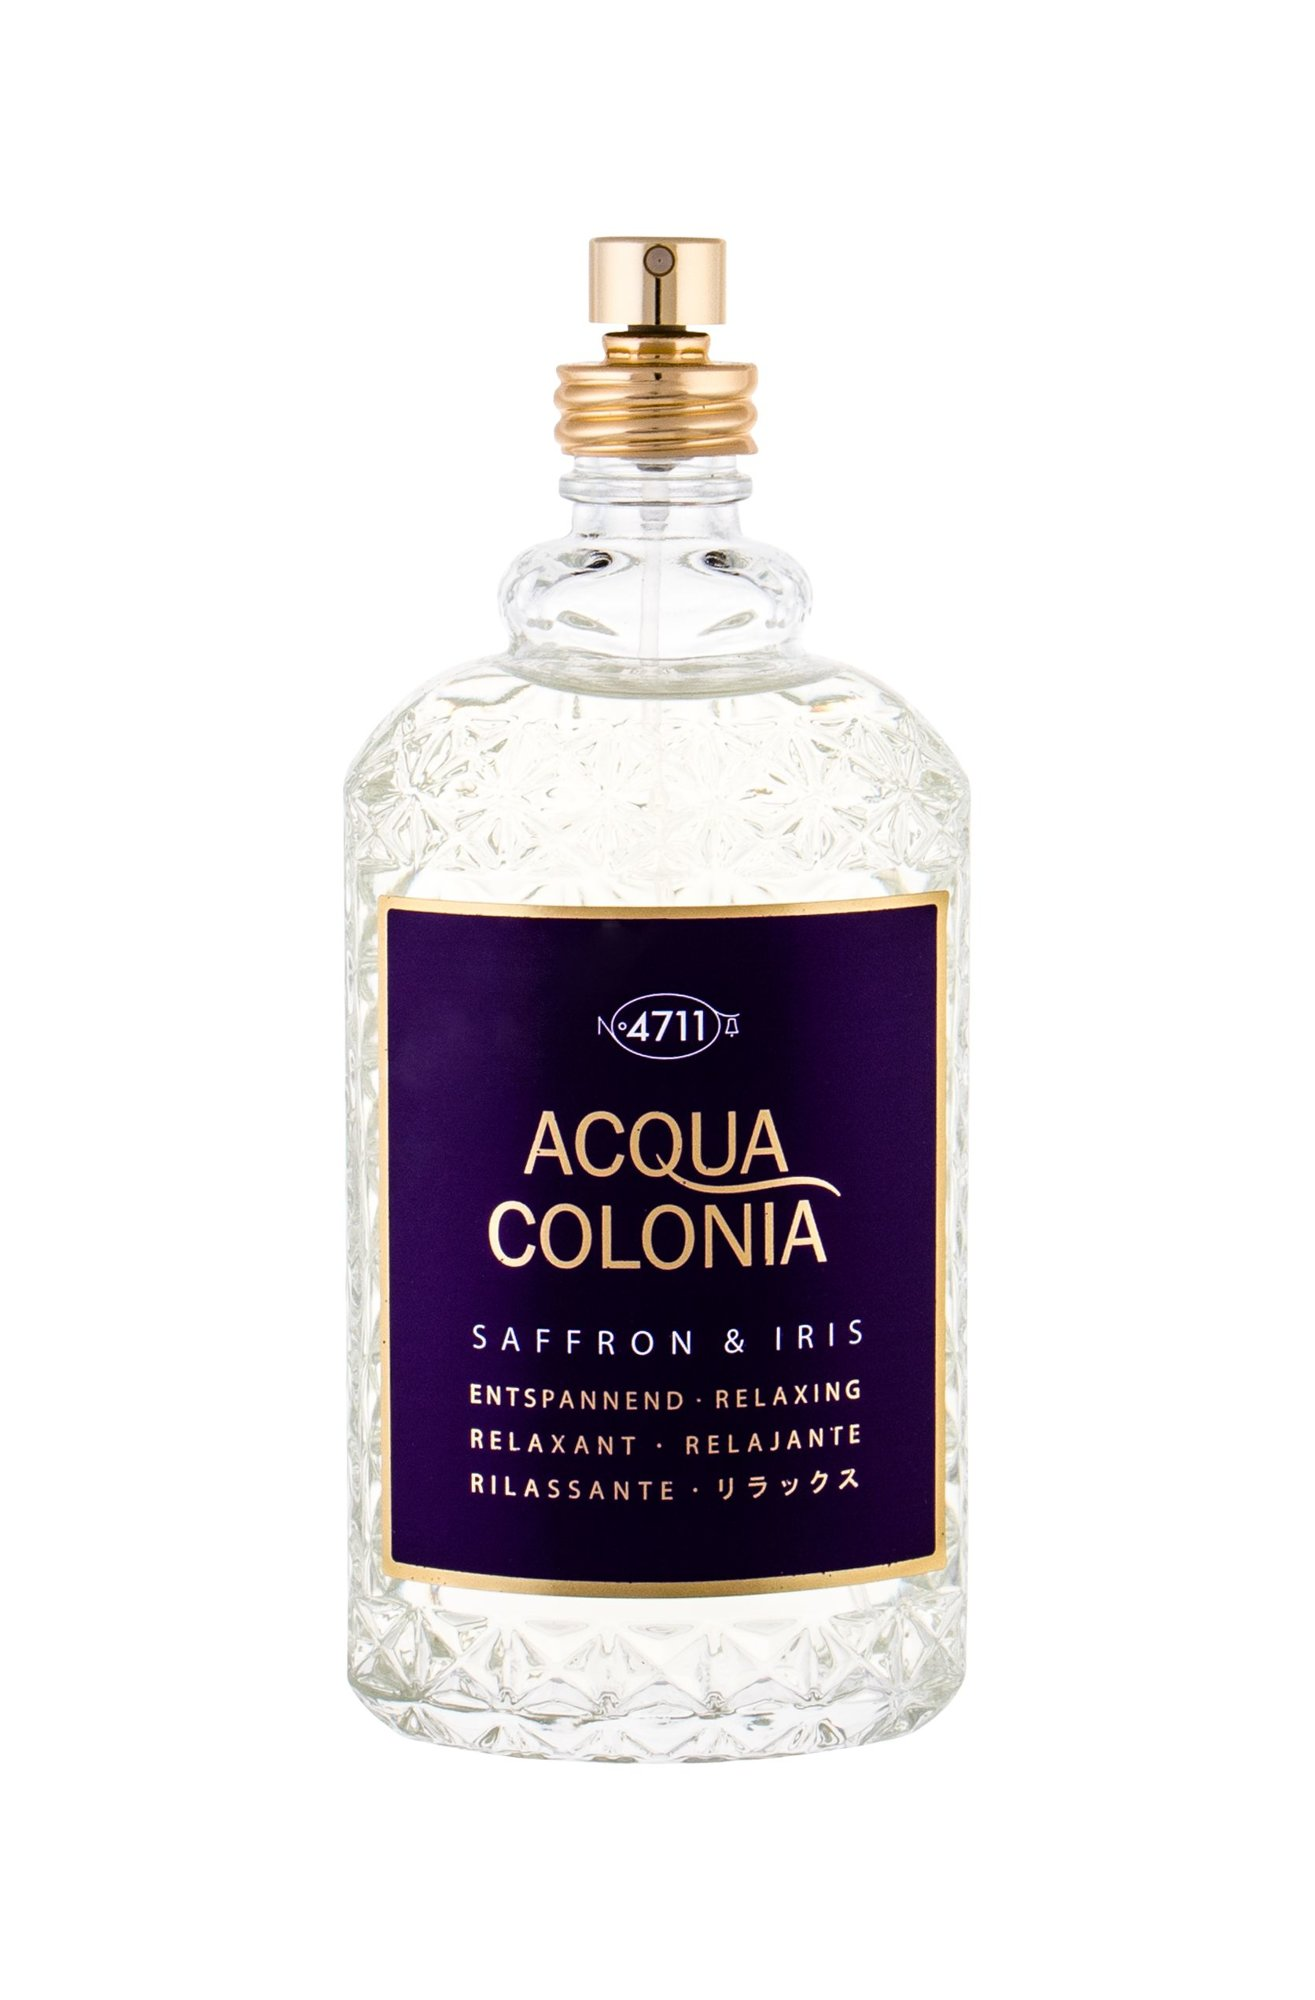 4711 Acqua Colonia Eau de Cologne 170ml